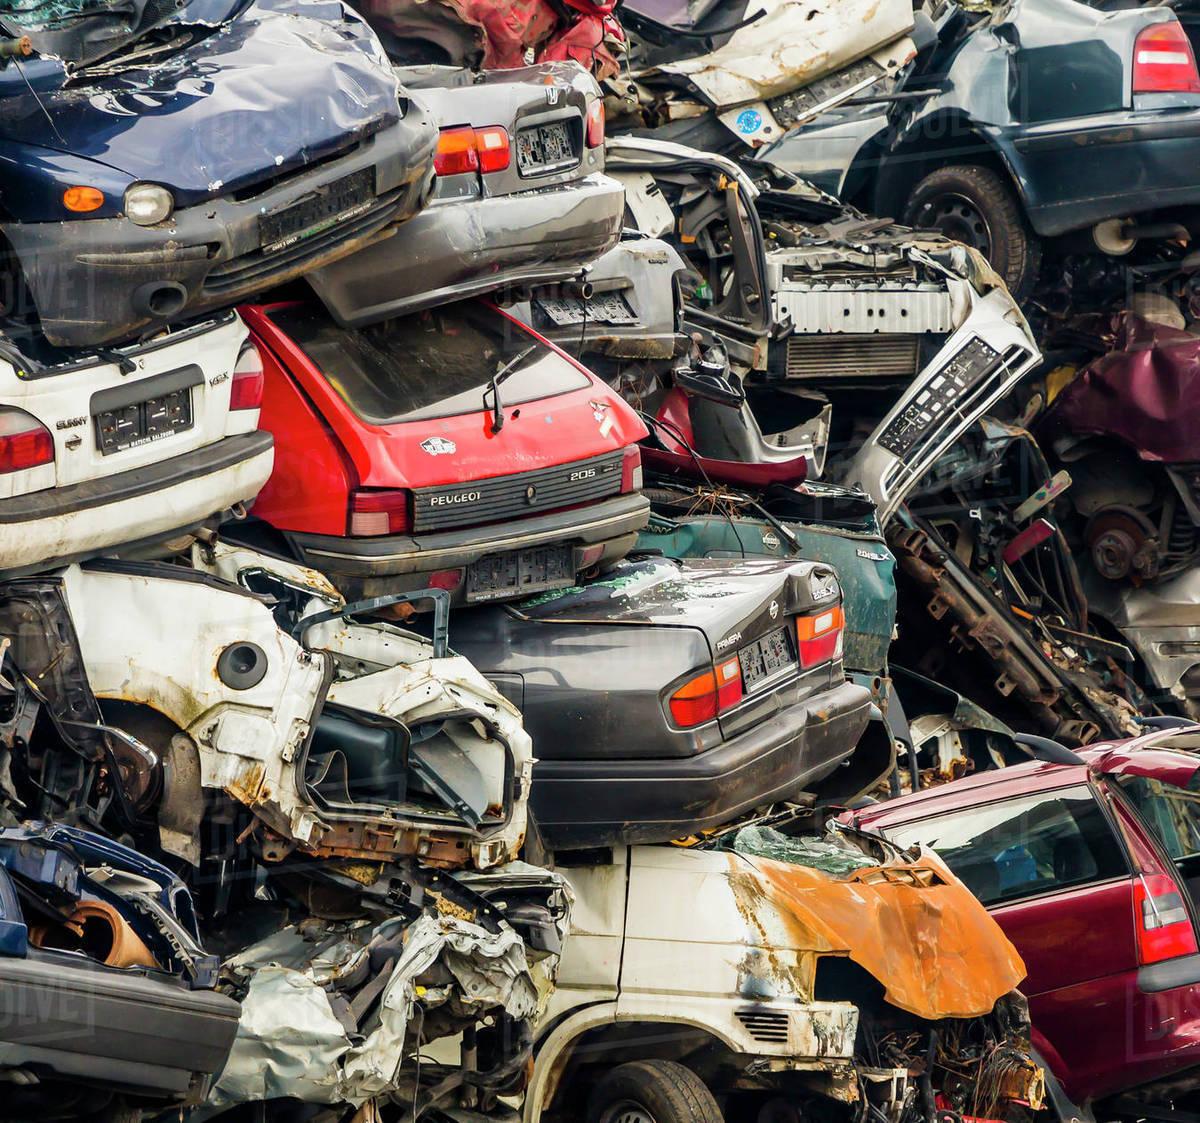 Scrap yard, scrap cars - Stock Photo - Dissolve